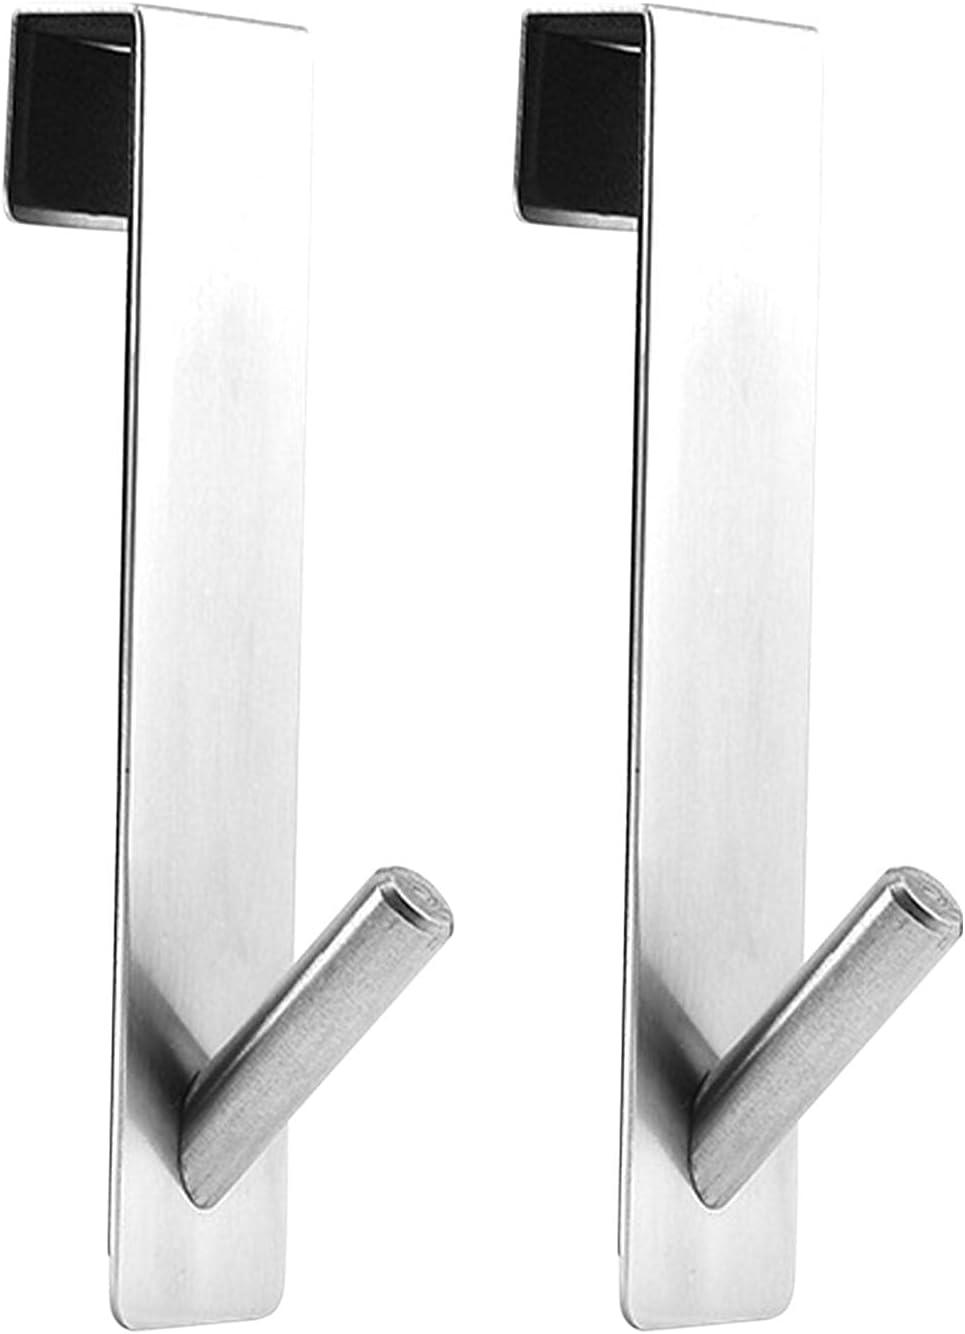 Over Door 55% OFF Hooks Rapid rise Stainless Steel Hook Home Stora Single